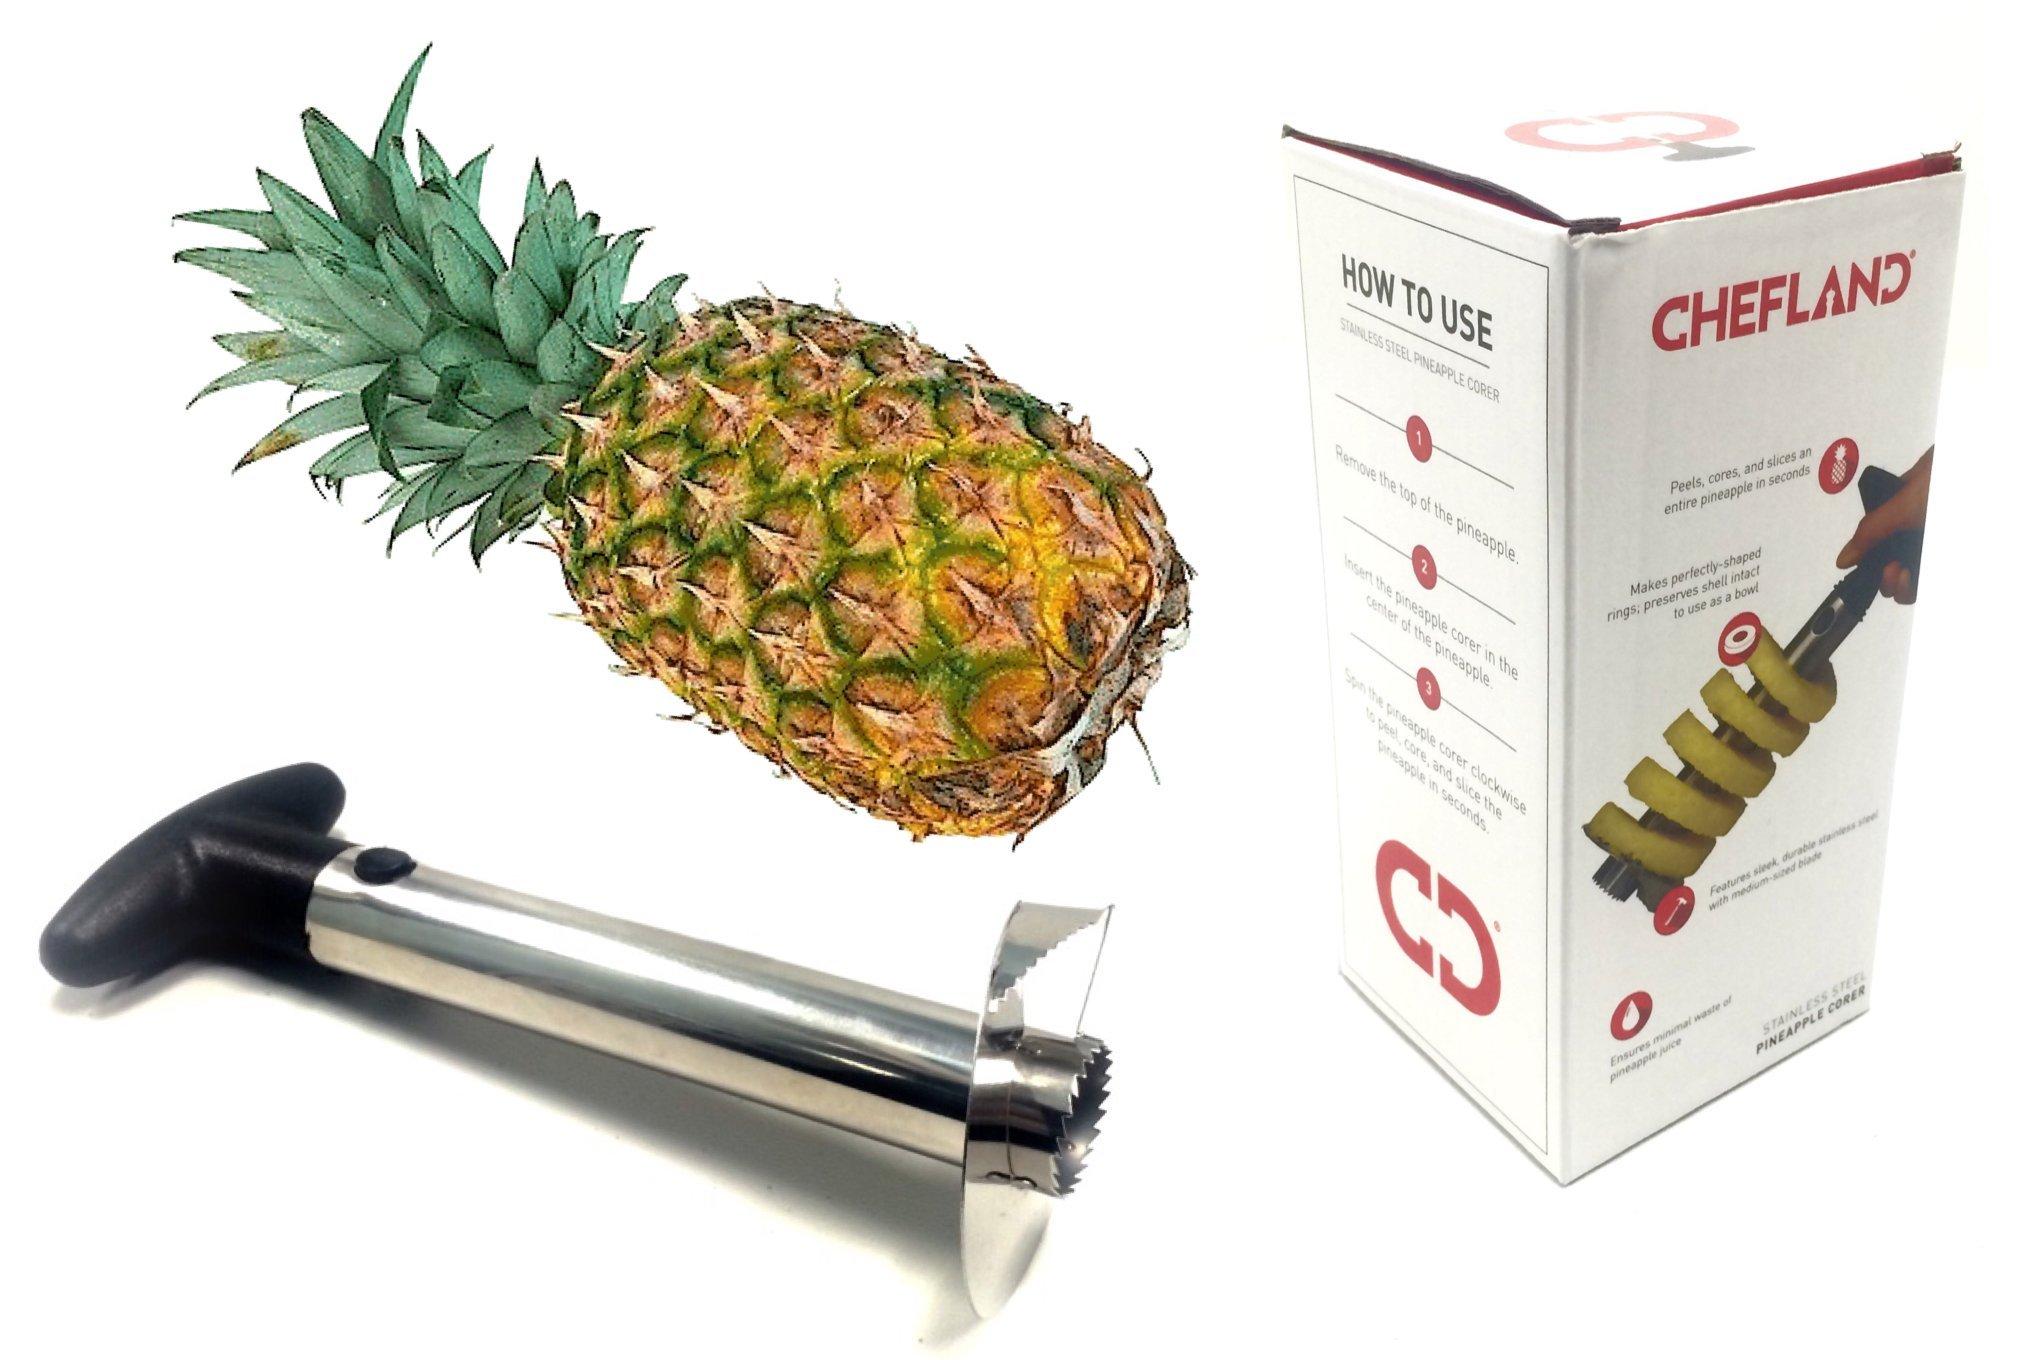 ChefLand Stainless Steel Pineapple Peeler, Pineapple Corer, Pineapple Slicer - All In One Kitchen Gadget